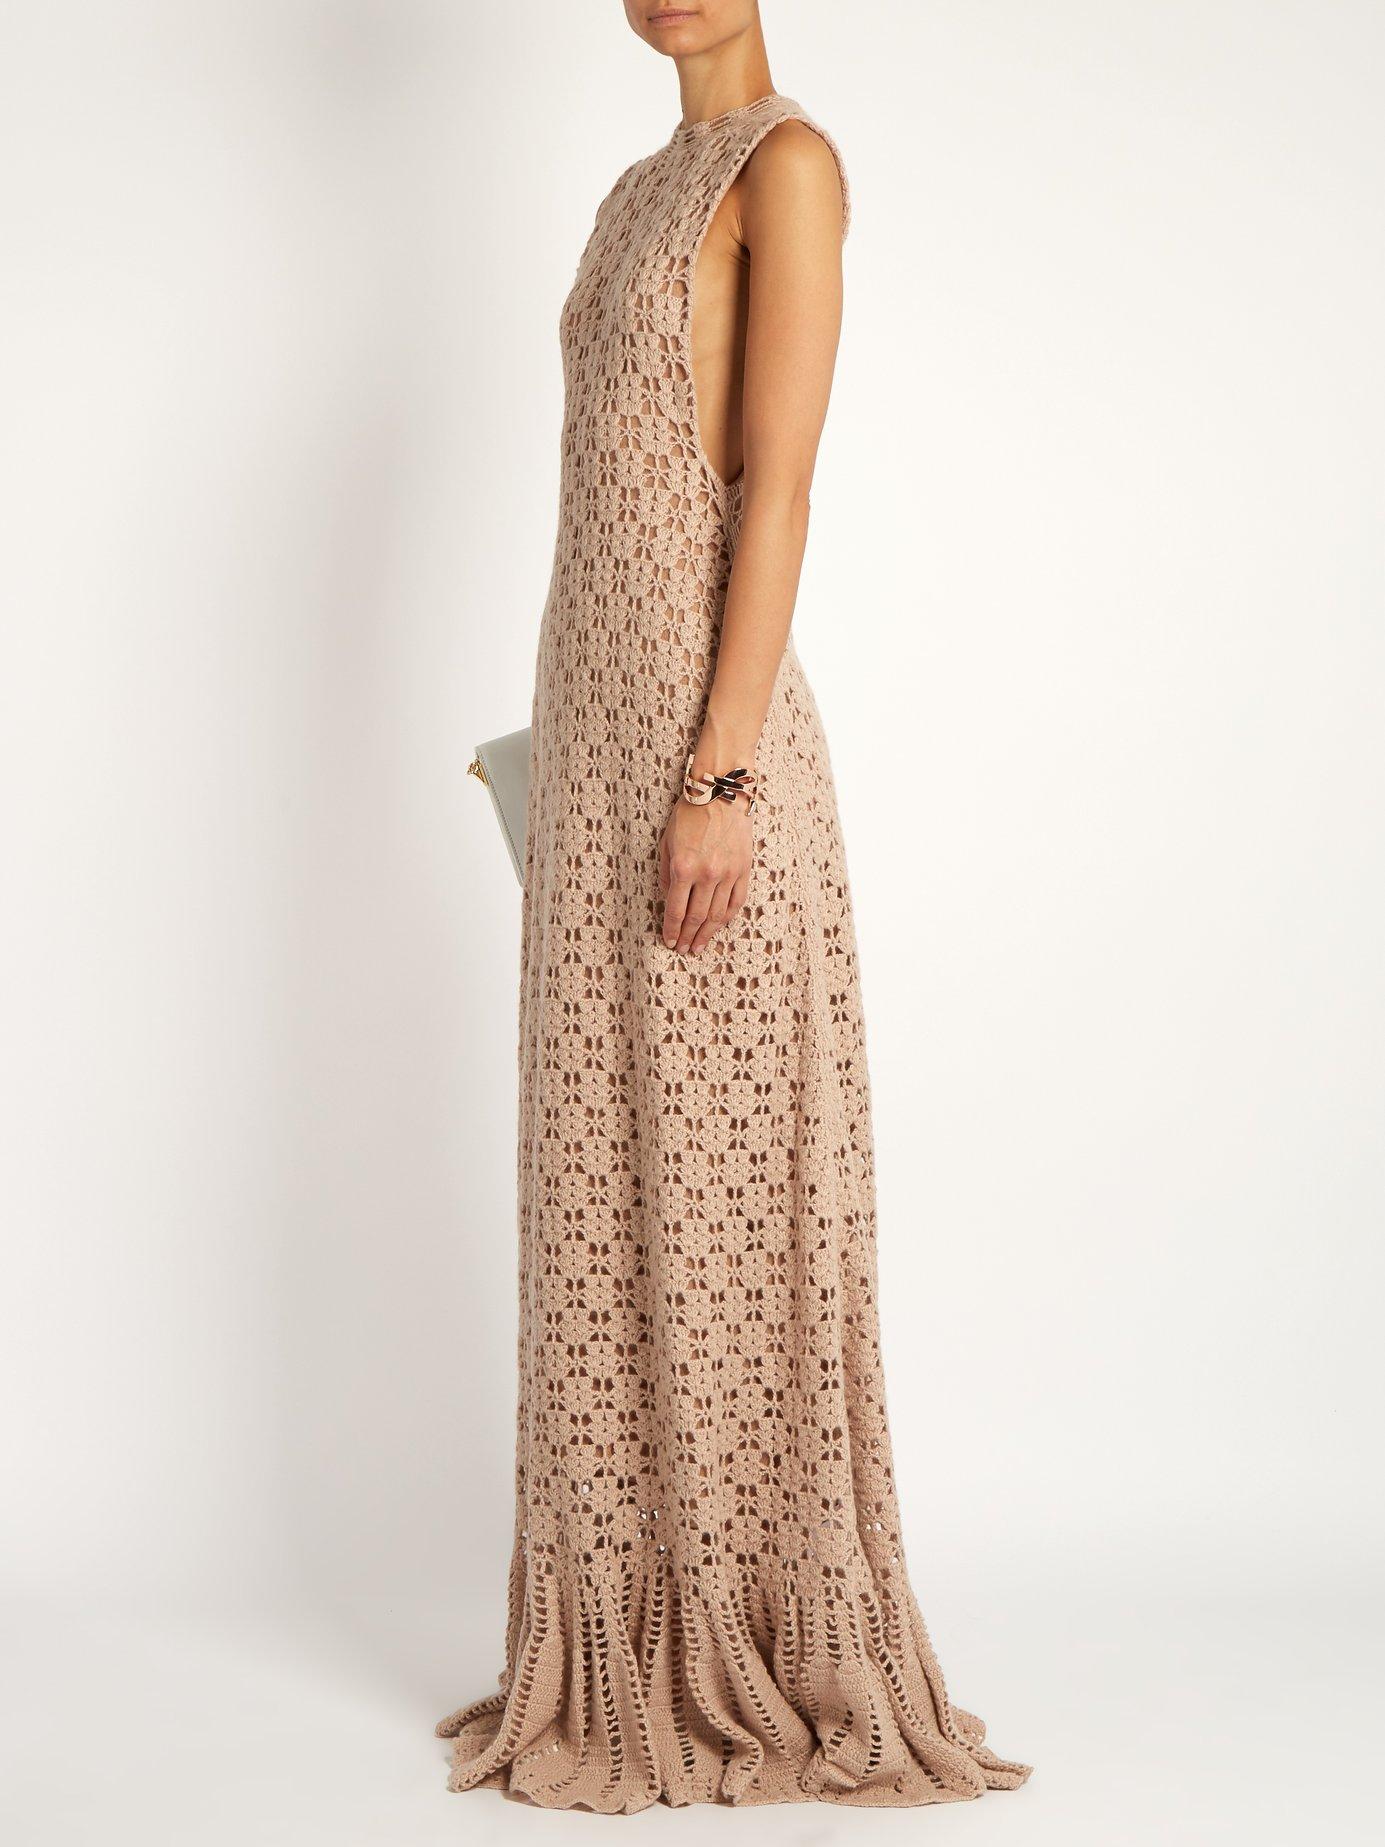 Ruffled-hem cashmere crochet-knit maxi dress by Ryan Roche